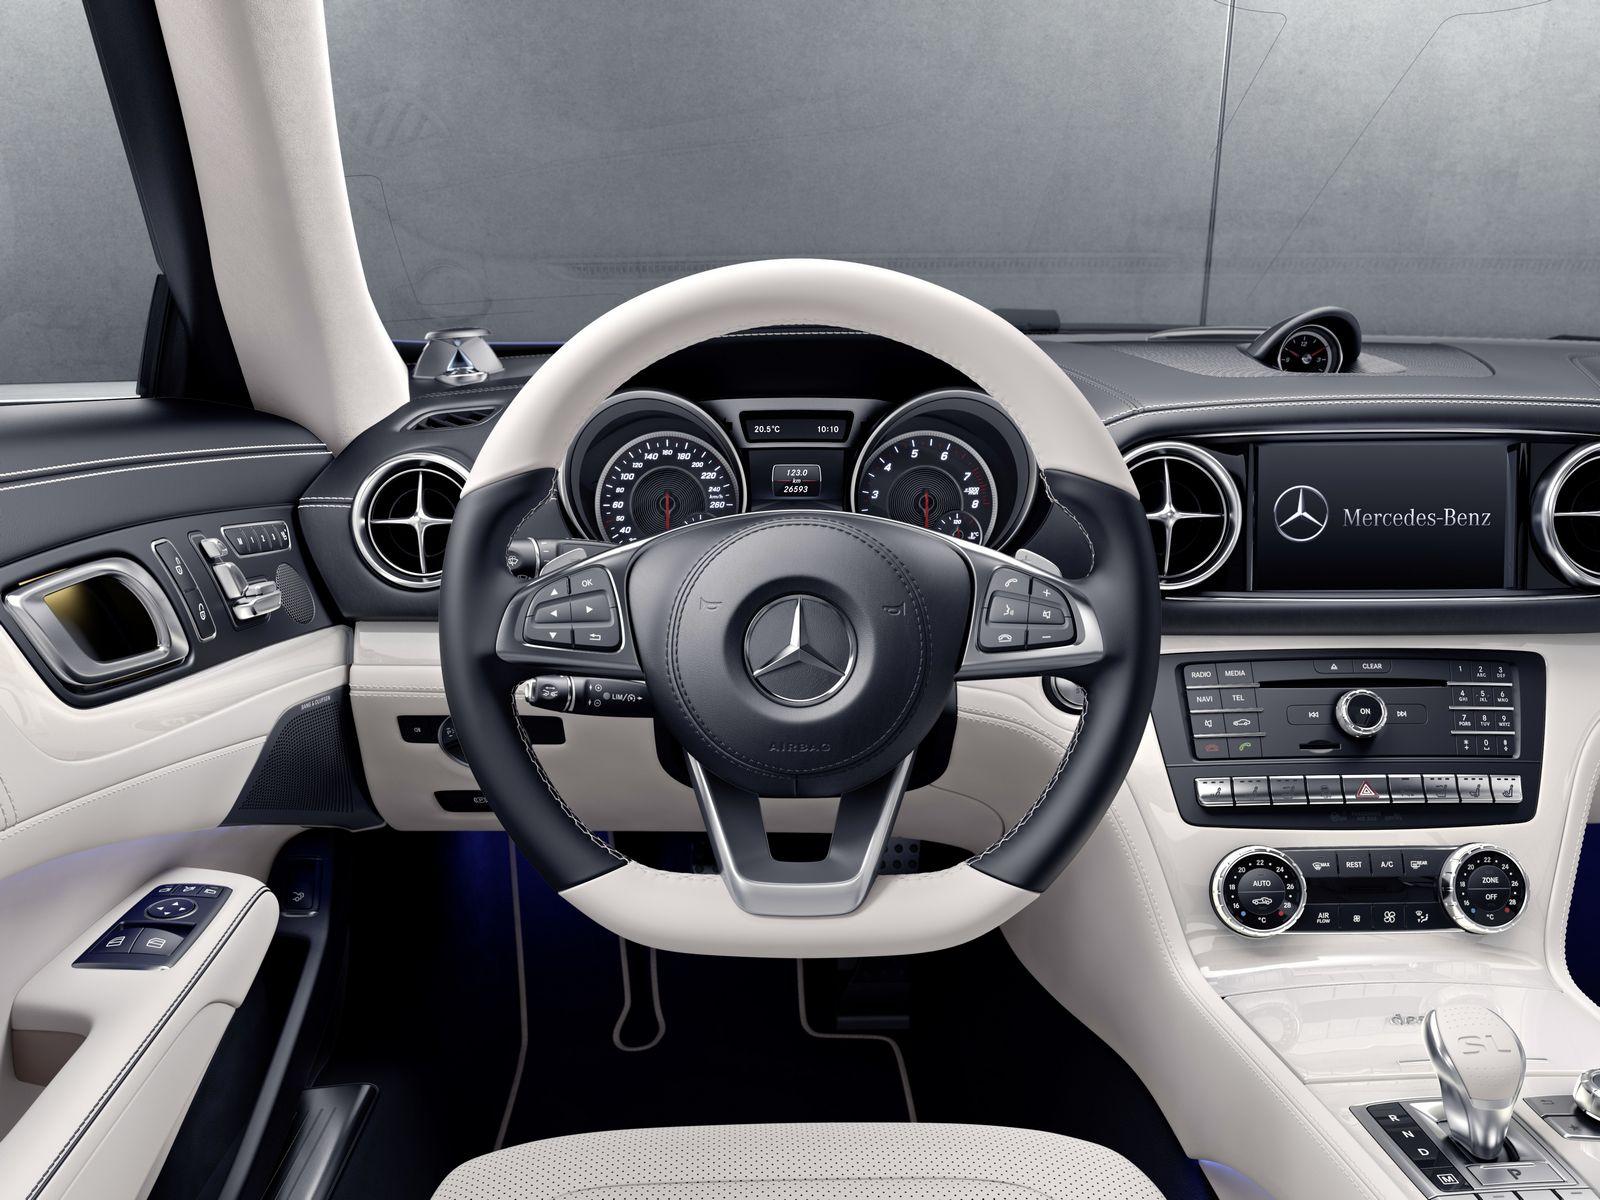 2015 - [Mercedes] SL Restylé [R231] - Page 4 Mercedes%2BSL%2Band%2BSLC%2B-%2B19